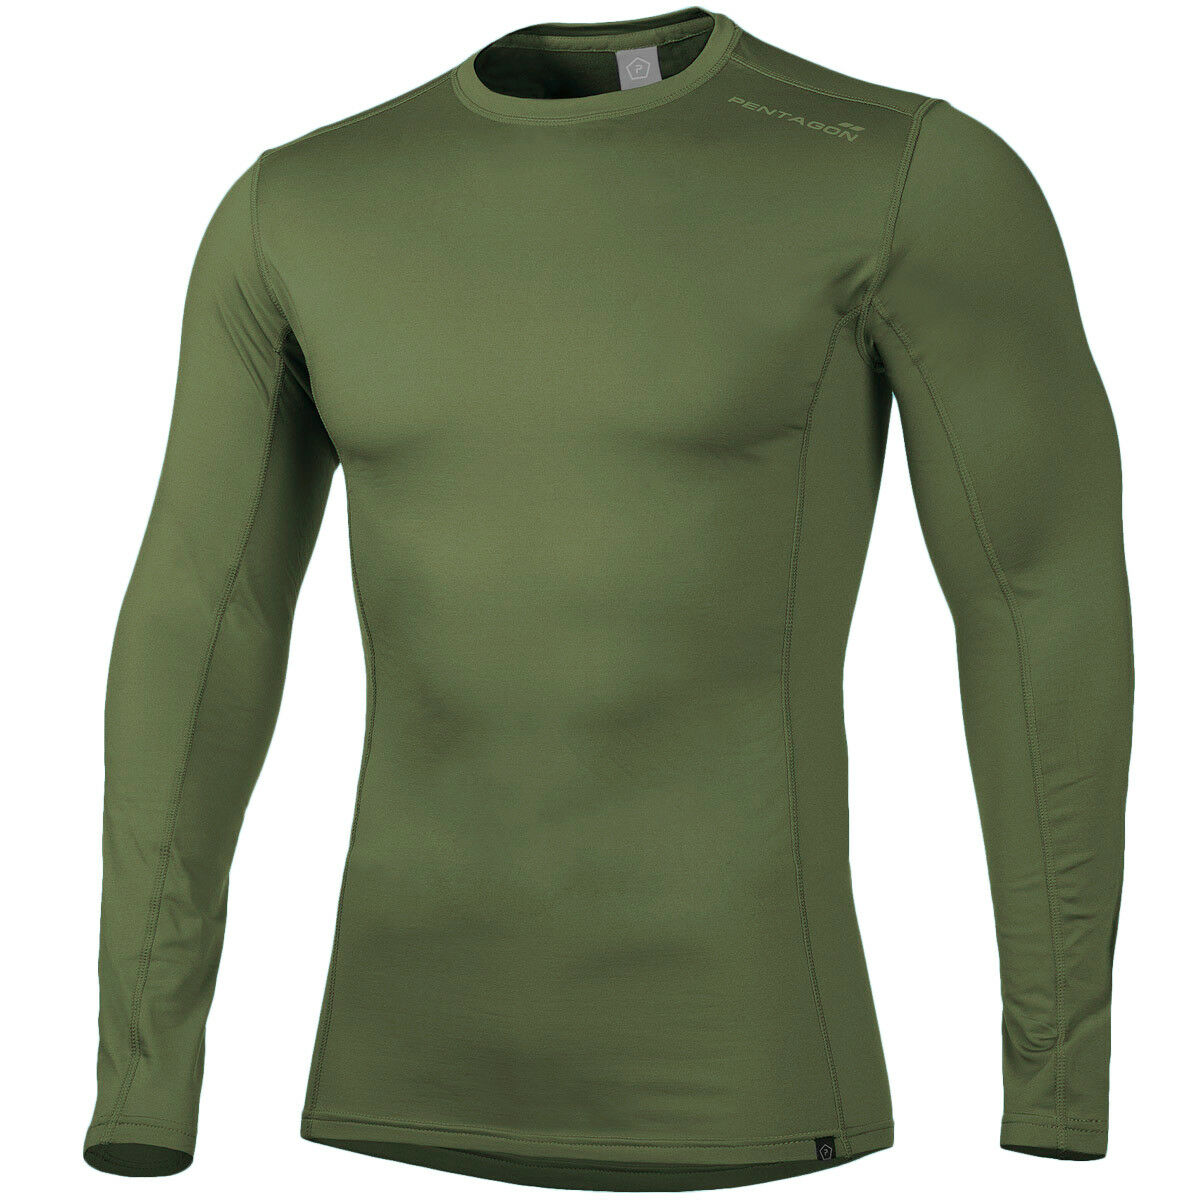 Pentagon Pindos 2.0 Thermal Shirt Base Layer Outdoor Hunting Skiing Warm Olive